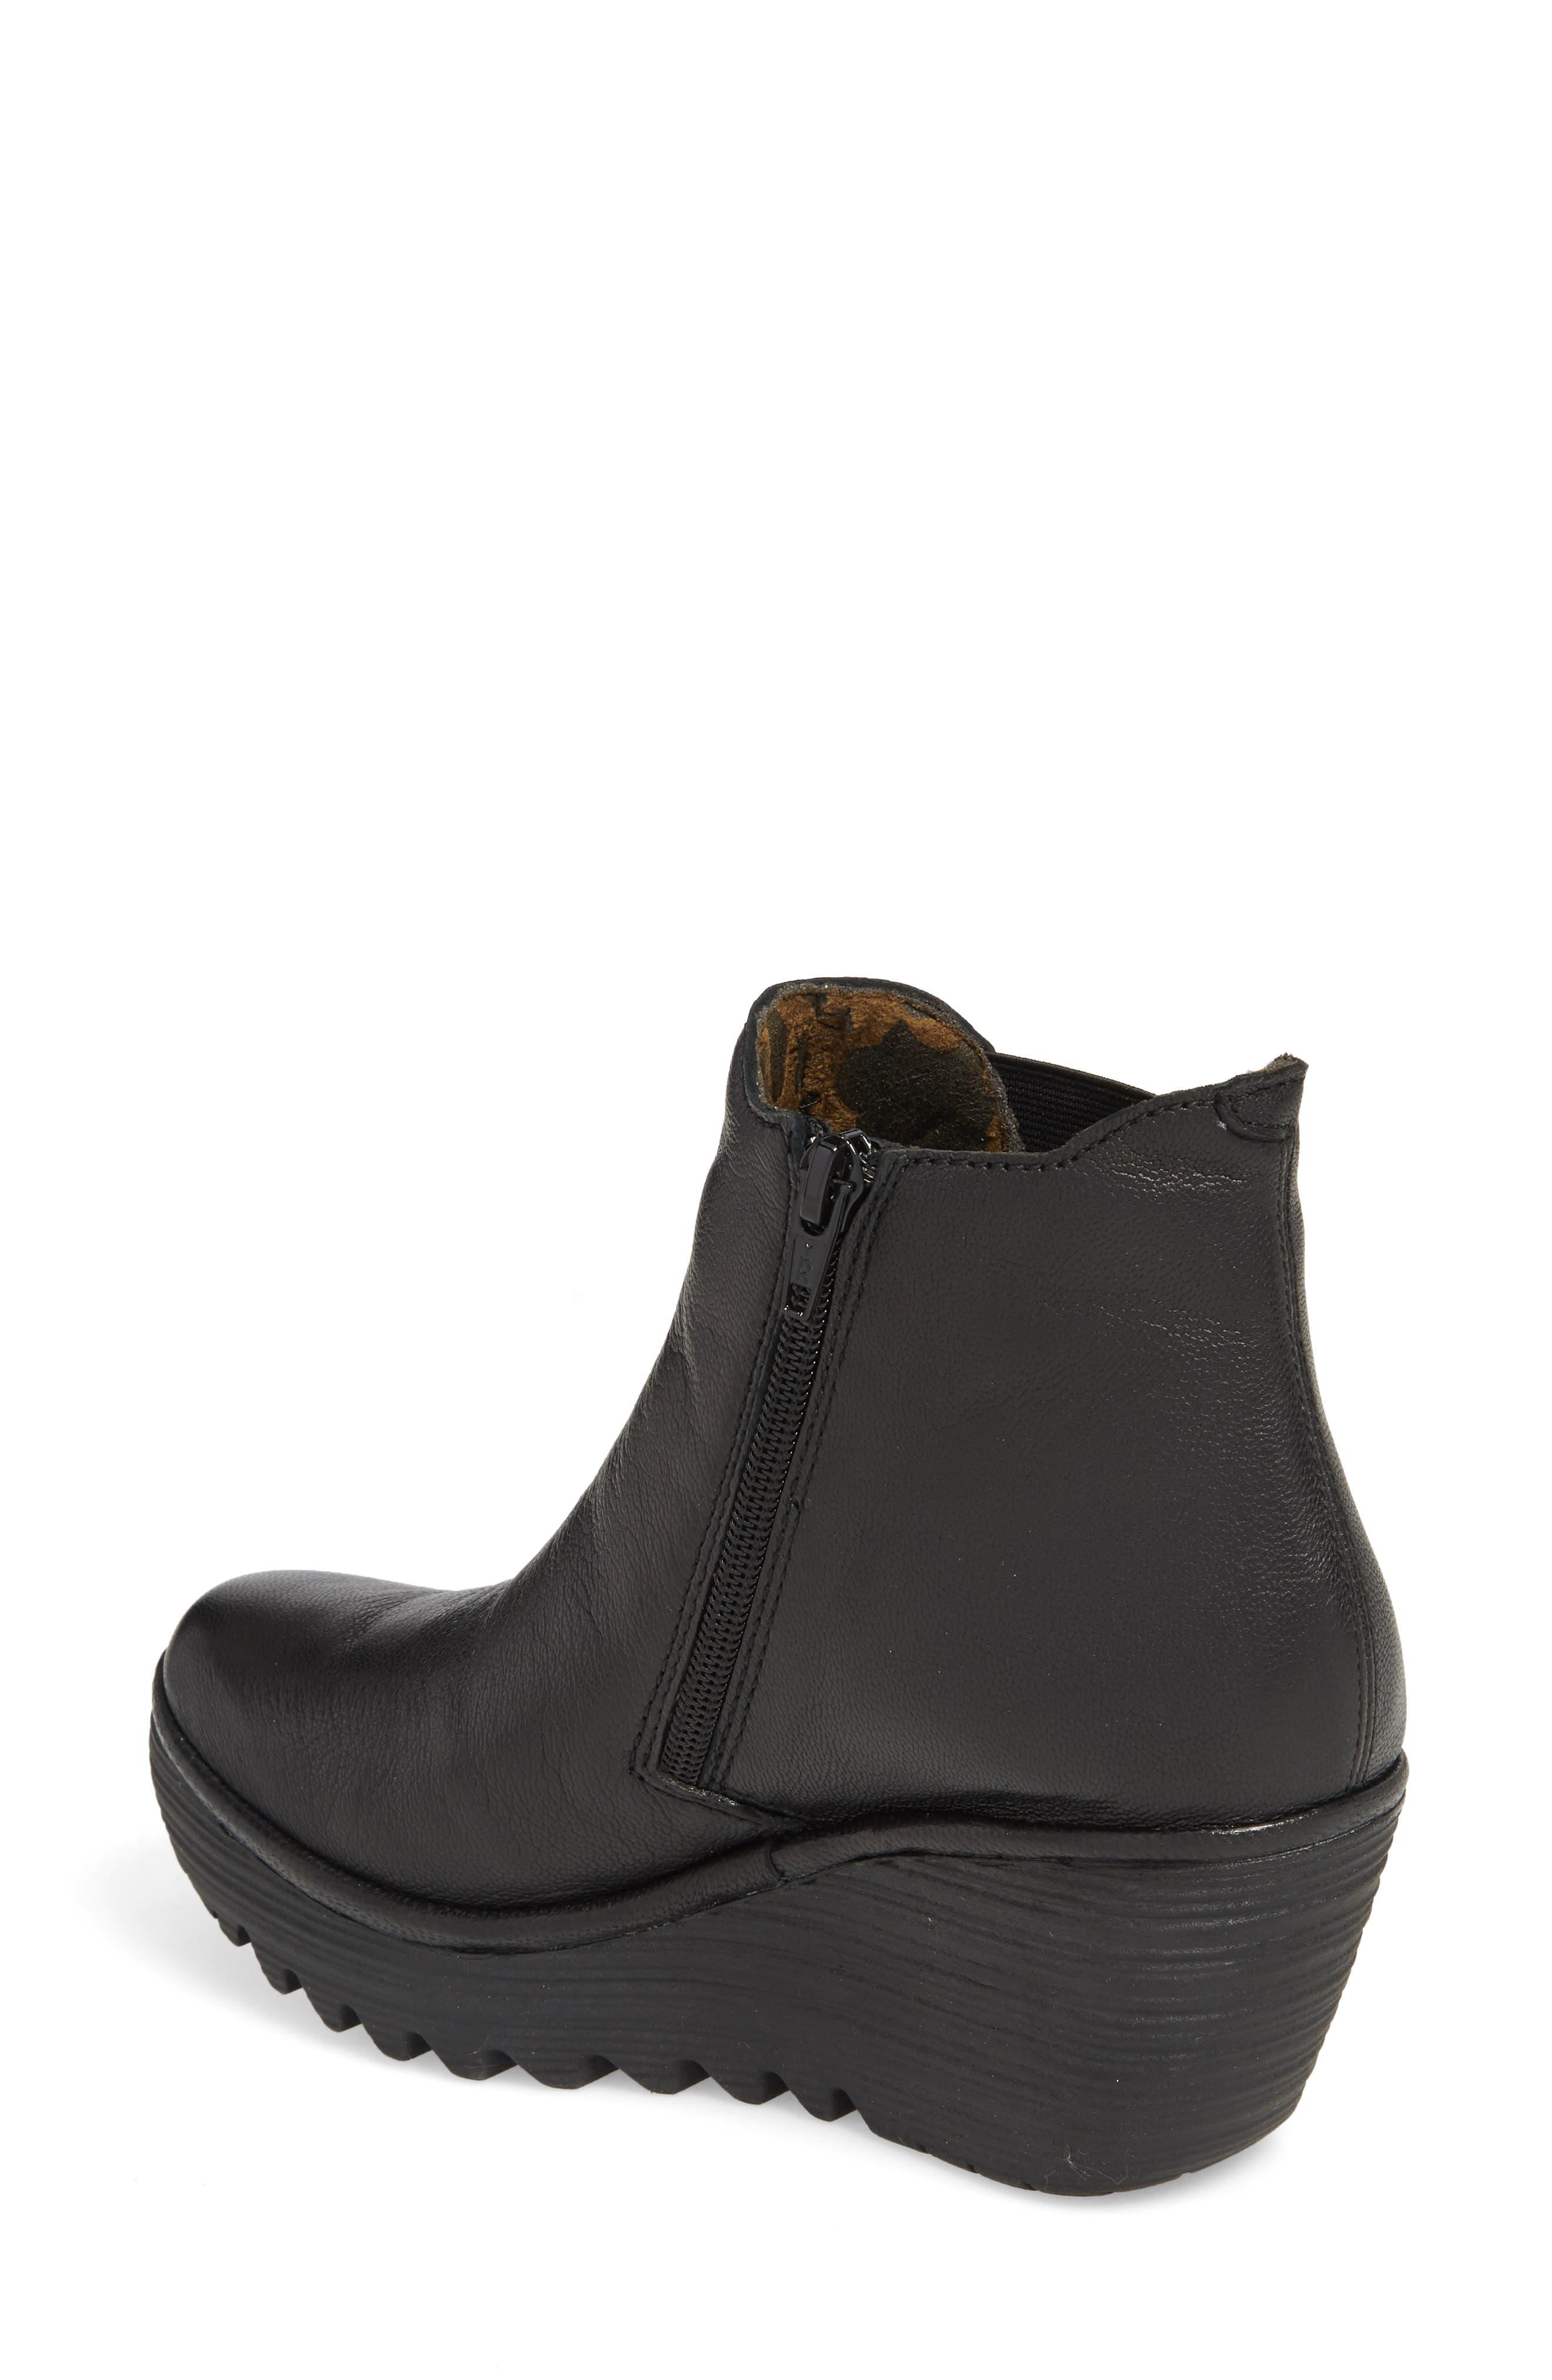 Yozo Wedge Boot,                             Alternate thumbnail 2, color,                             BLACK